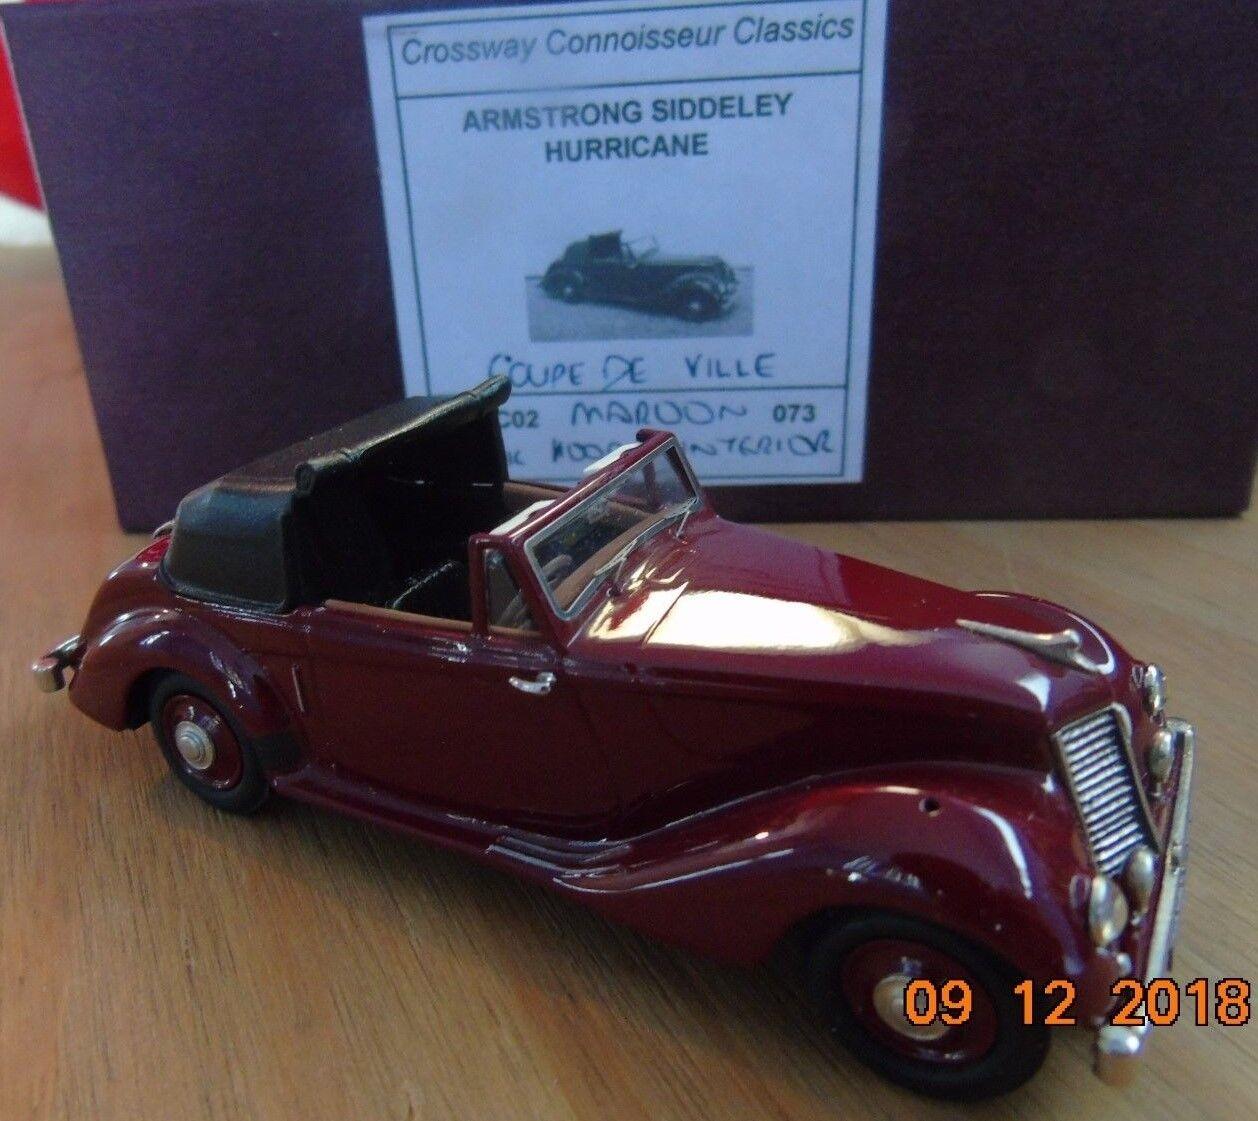 Crossway Models CCC02 Armstrong Siddeley Hurricane Maroon Coupe de Ville Ltd Ed